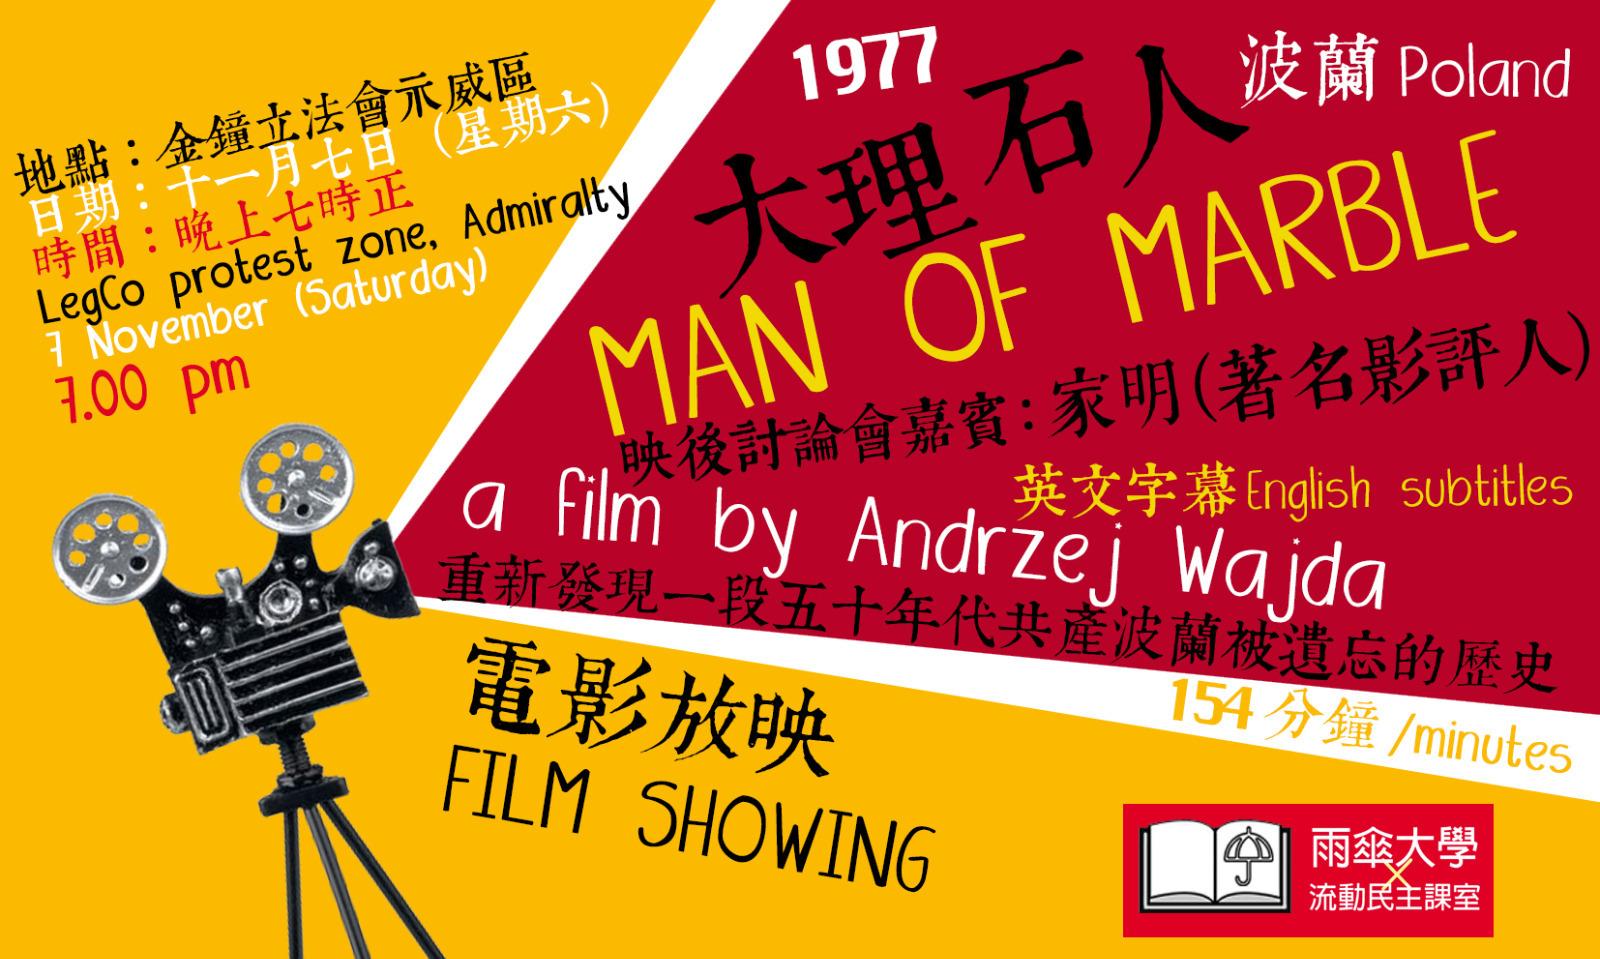 電影放映:《大理石人 Man of Marble》